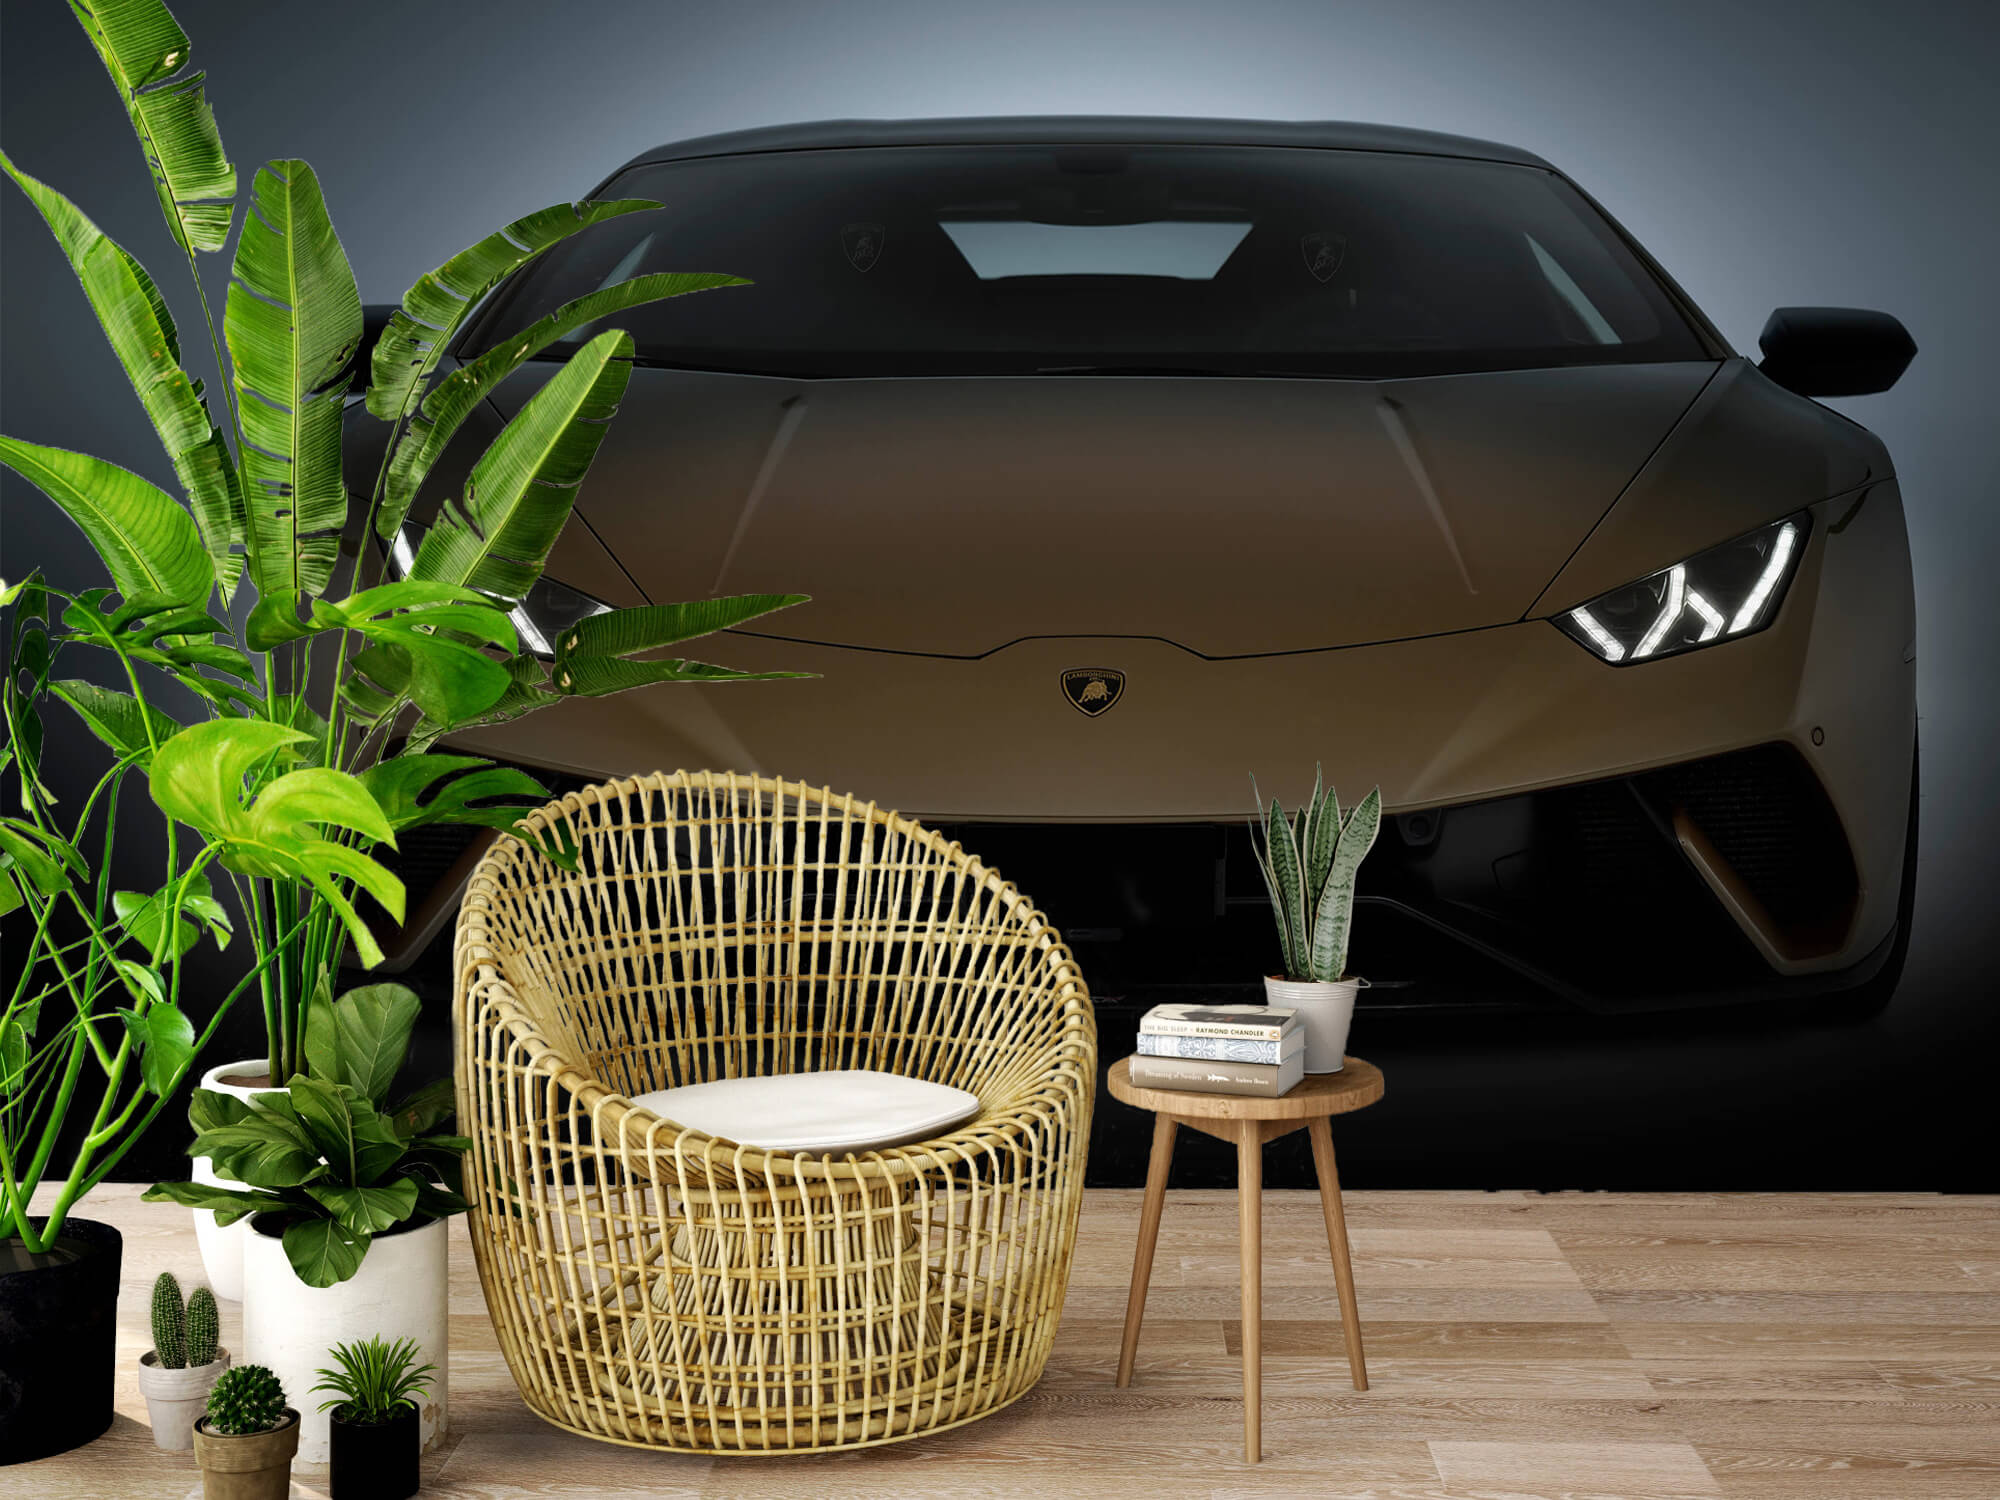 Wallpaper Lamborghini Huracán - Huracán - Fram 9